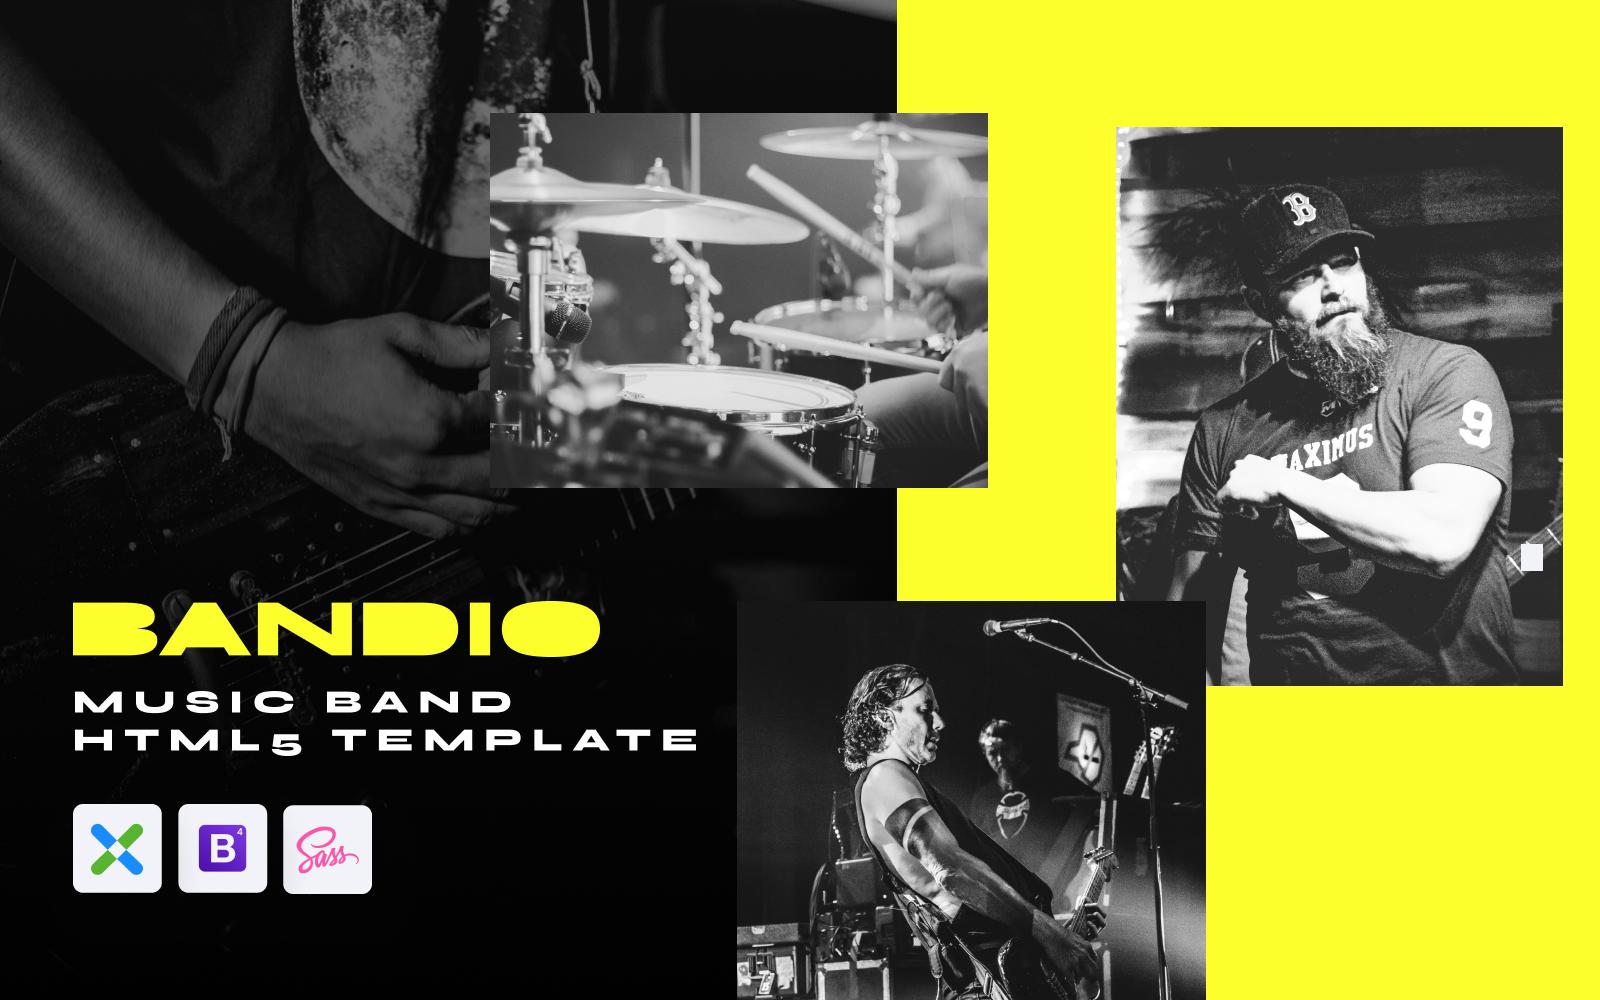 Bandio - Modern HTML5 Music and Band Template Web №148481